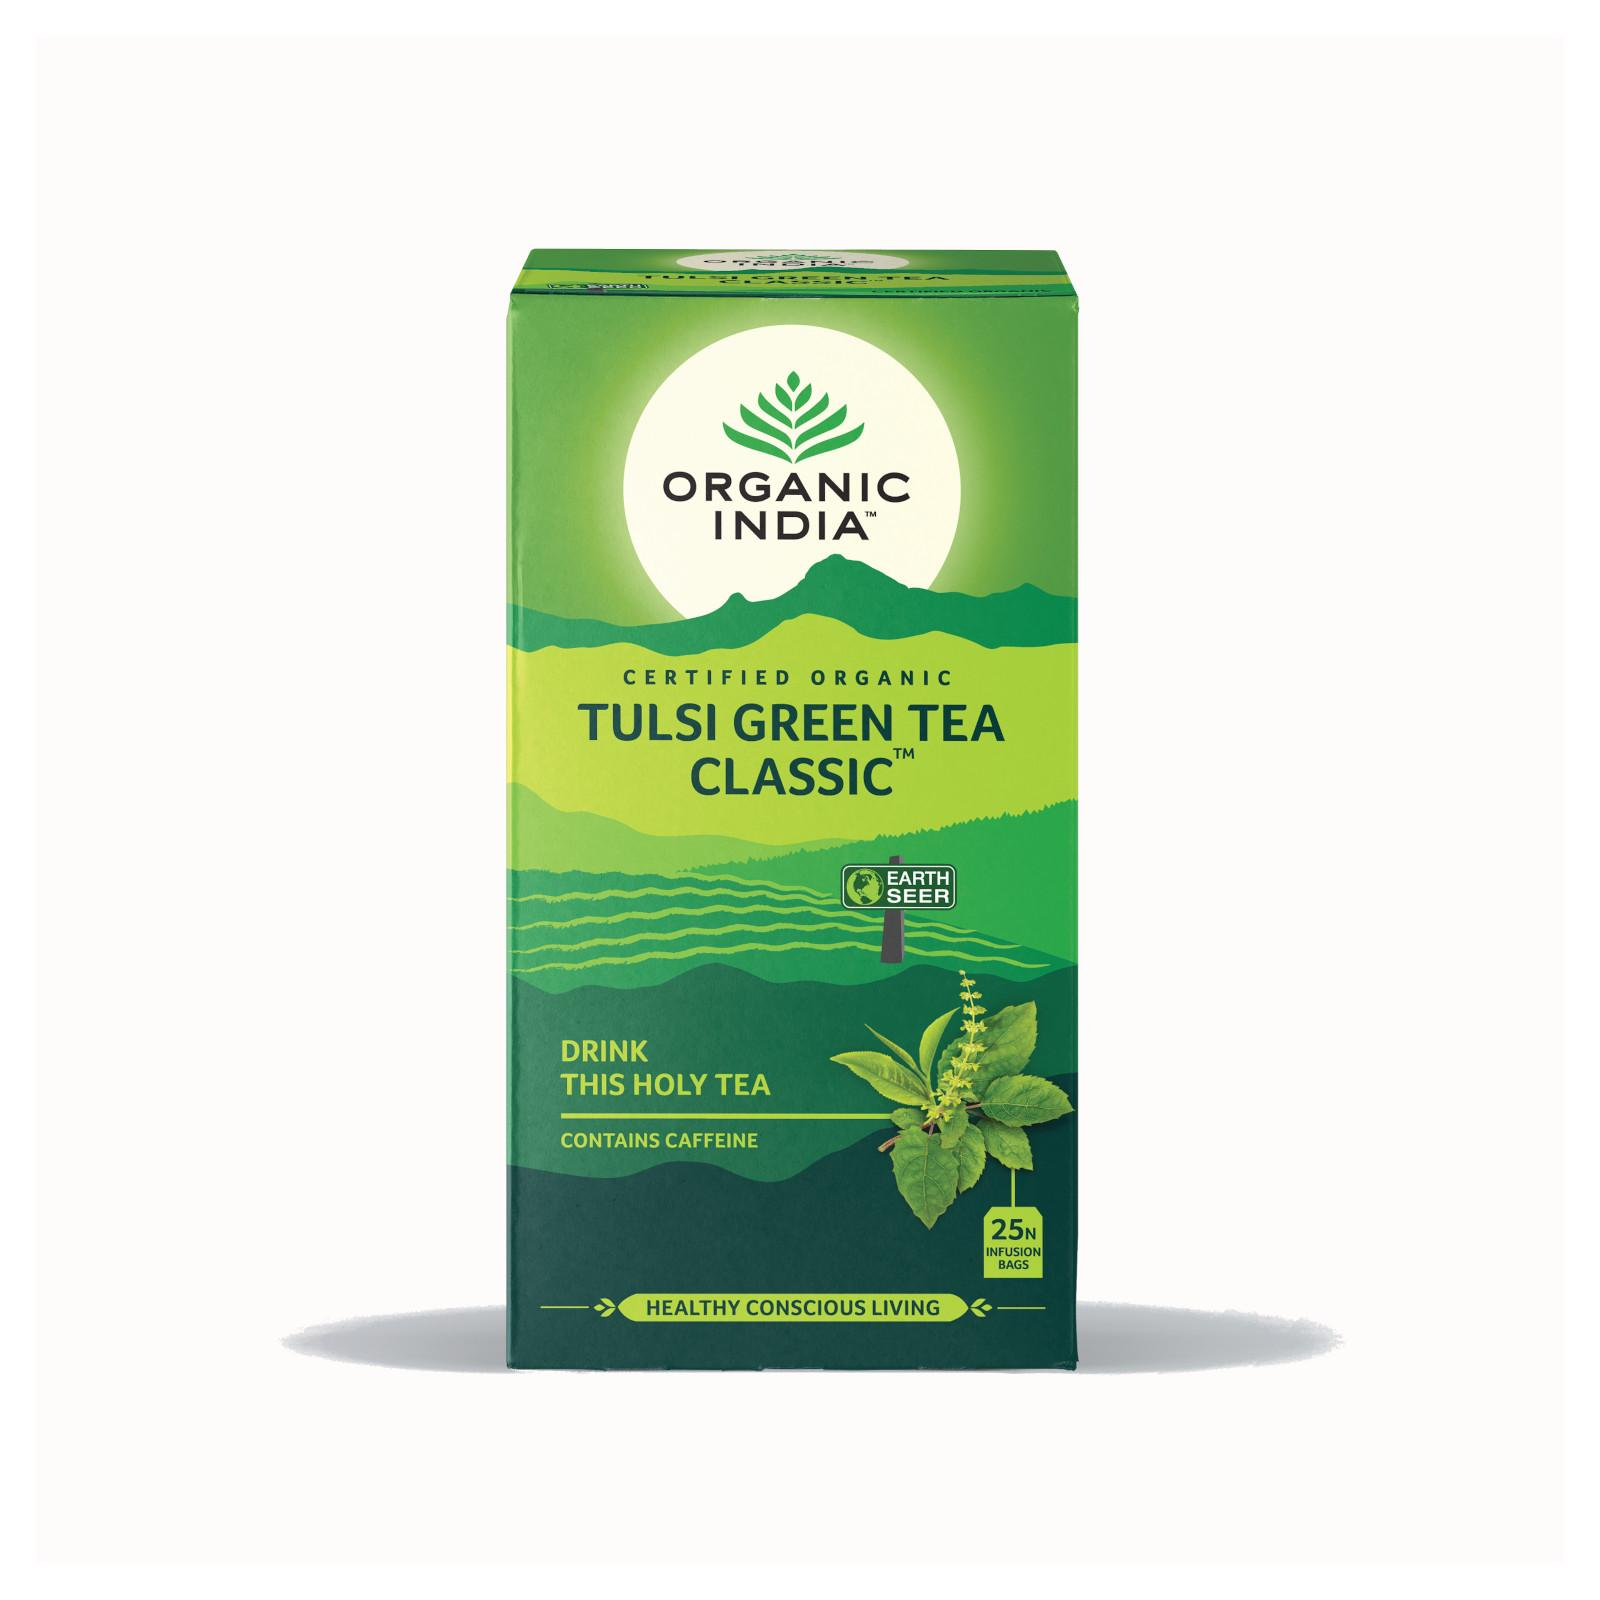 Organic India Čaj Tulsi Green, porcovaný, bio 43,5 g, 25 ks